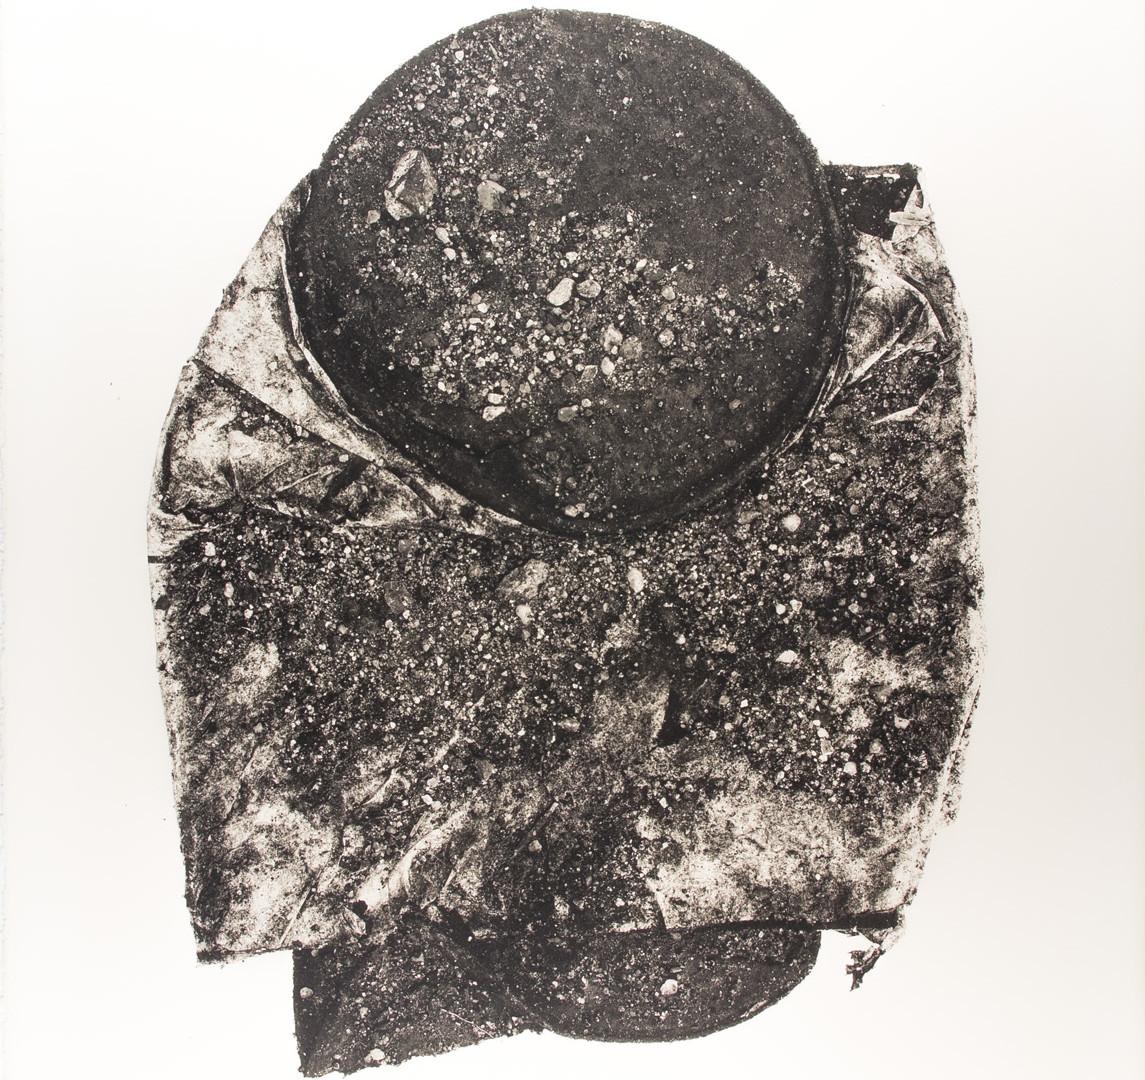 Irving Penn, Paper Cup, New York, 1975